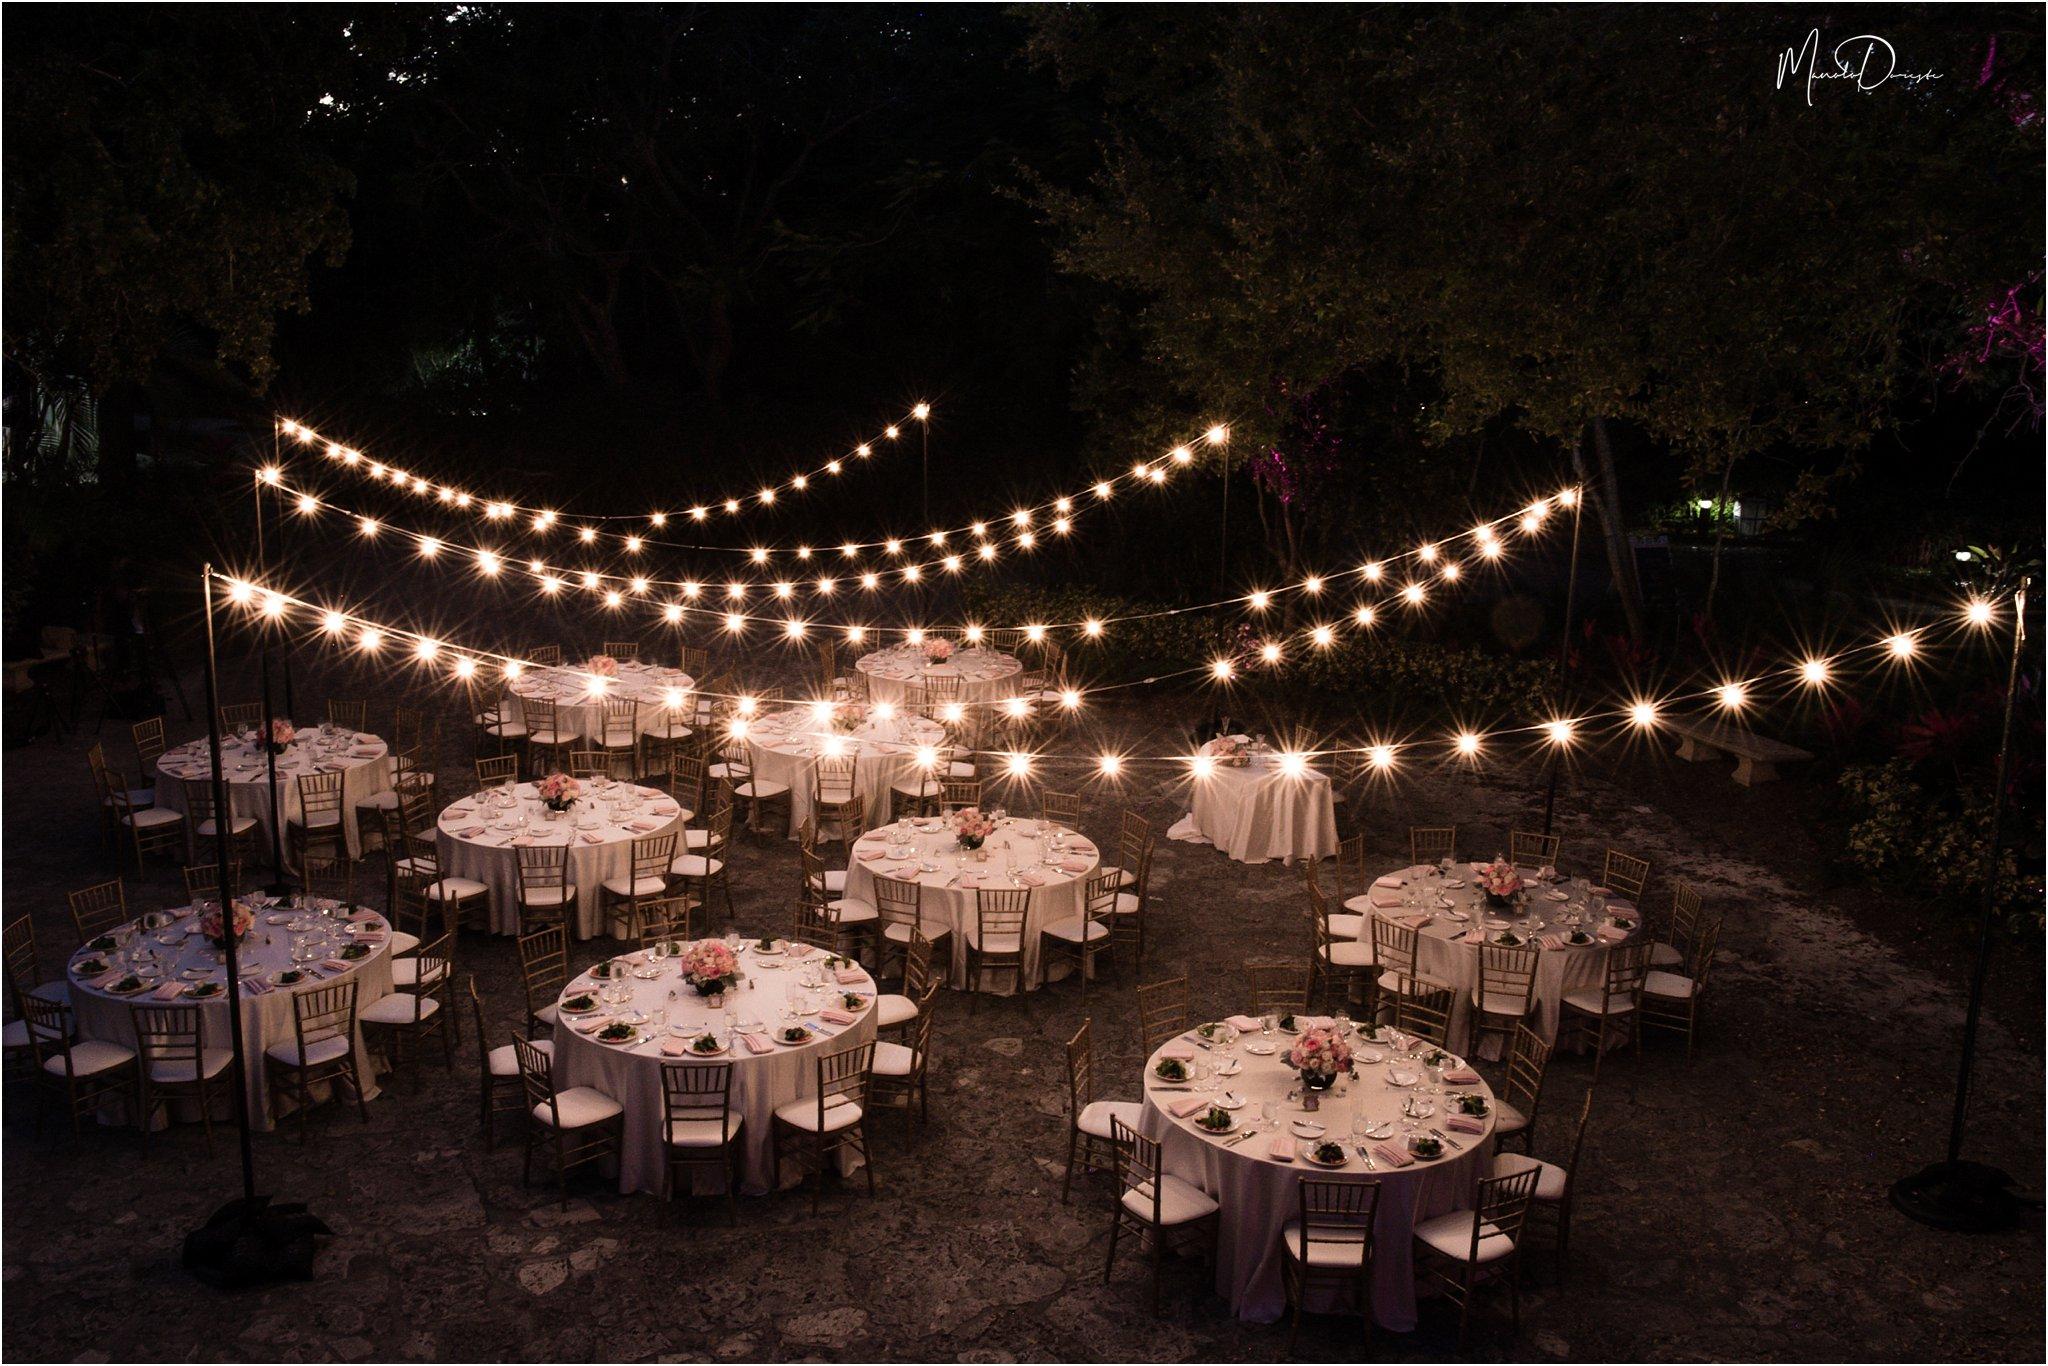 00844_ManoloDoreste_InFocusStudios_Wedding_Family_Photography_Miami_MiamiPhotographer.jpg